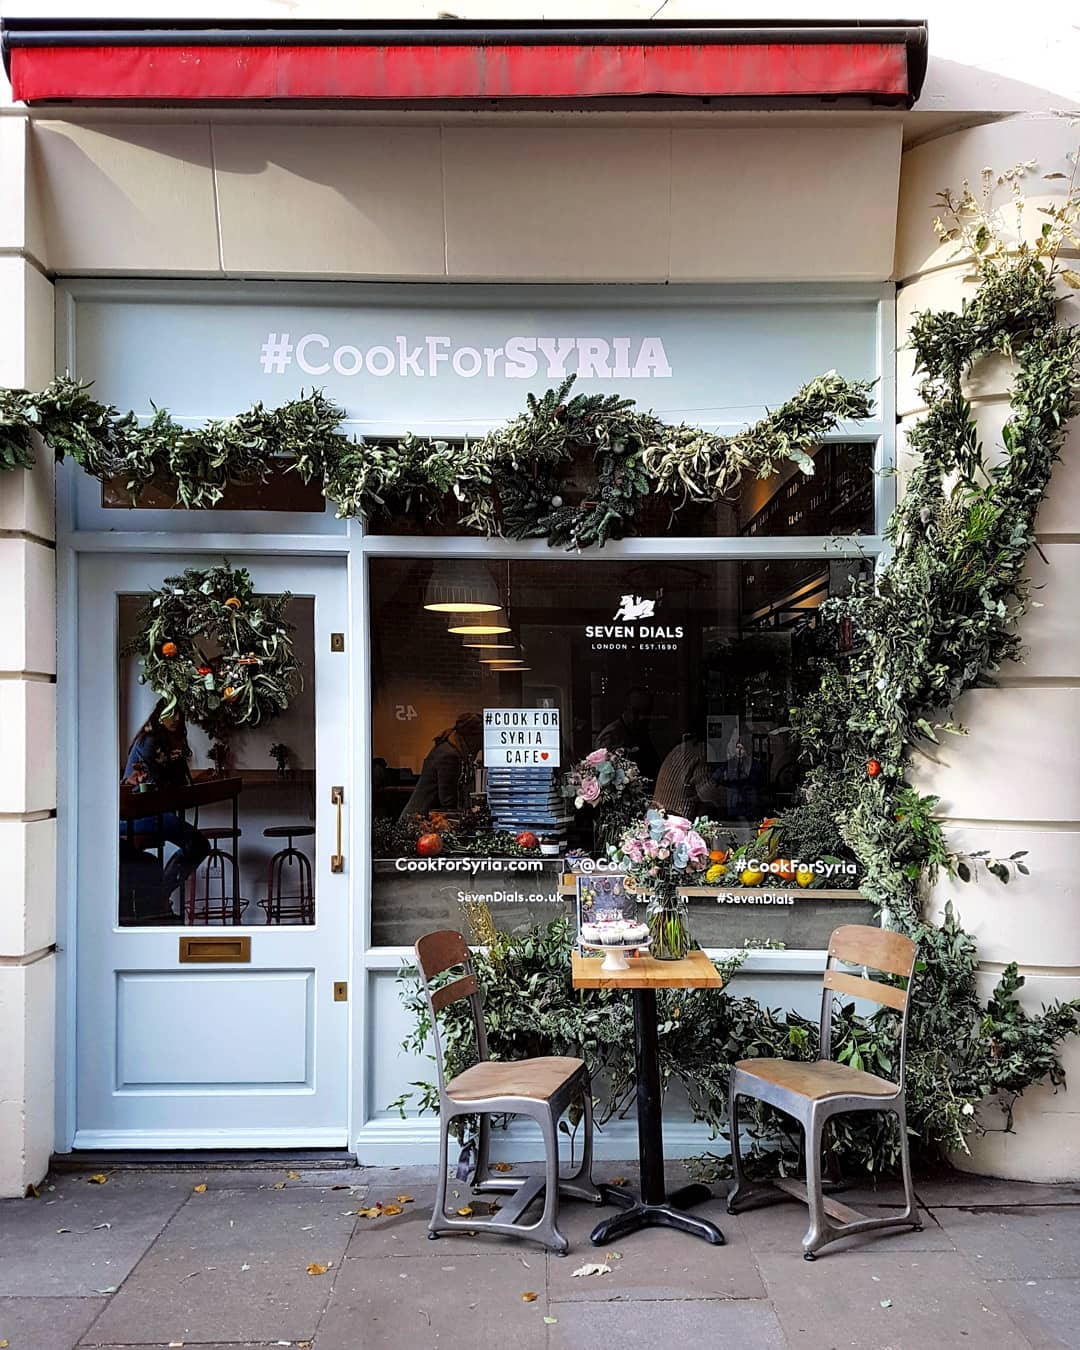 Kitchen Garden London: London Pop-ups: The #CookForSyria Pop-up Cafe In Monmouth